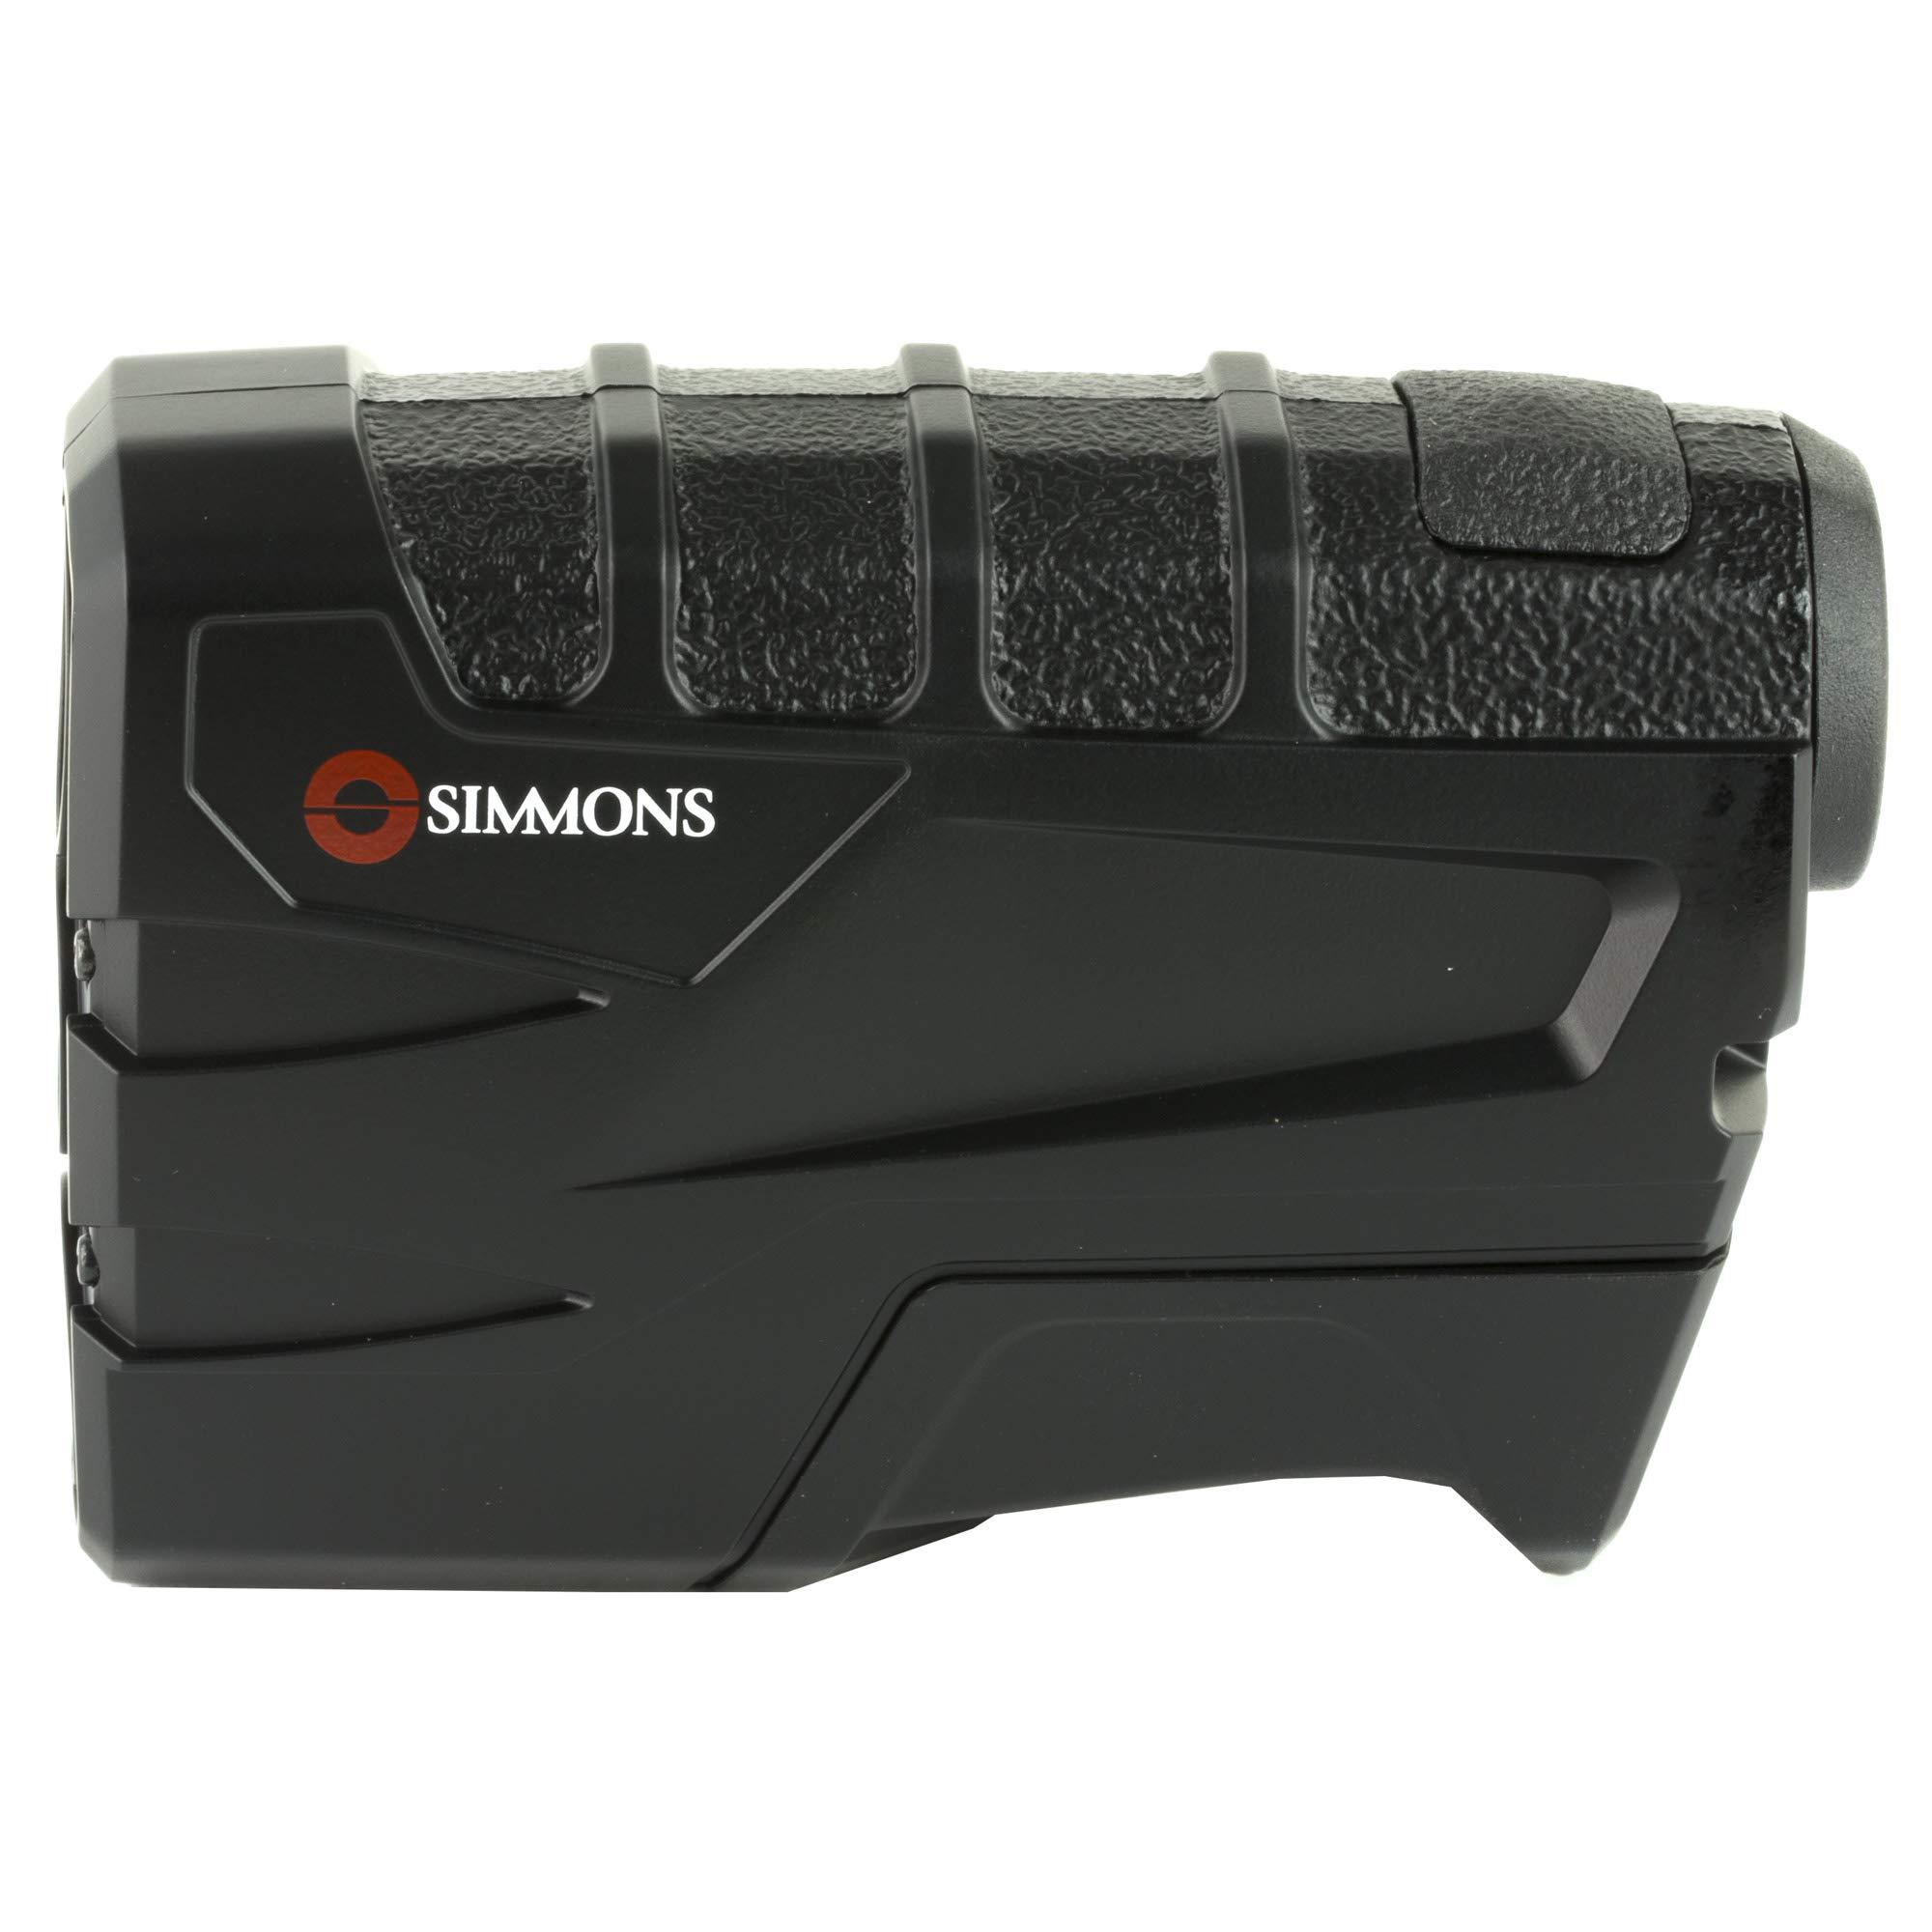 Simmons Brandnameinternalv 600, Rangefinder, V 600, 4X Power, 20 Objective, Single Button, Black Finish, Box 5L